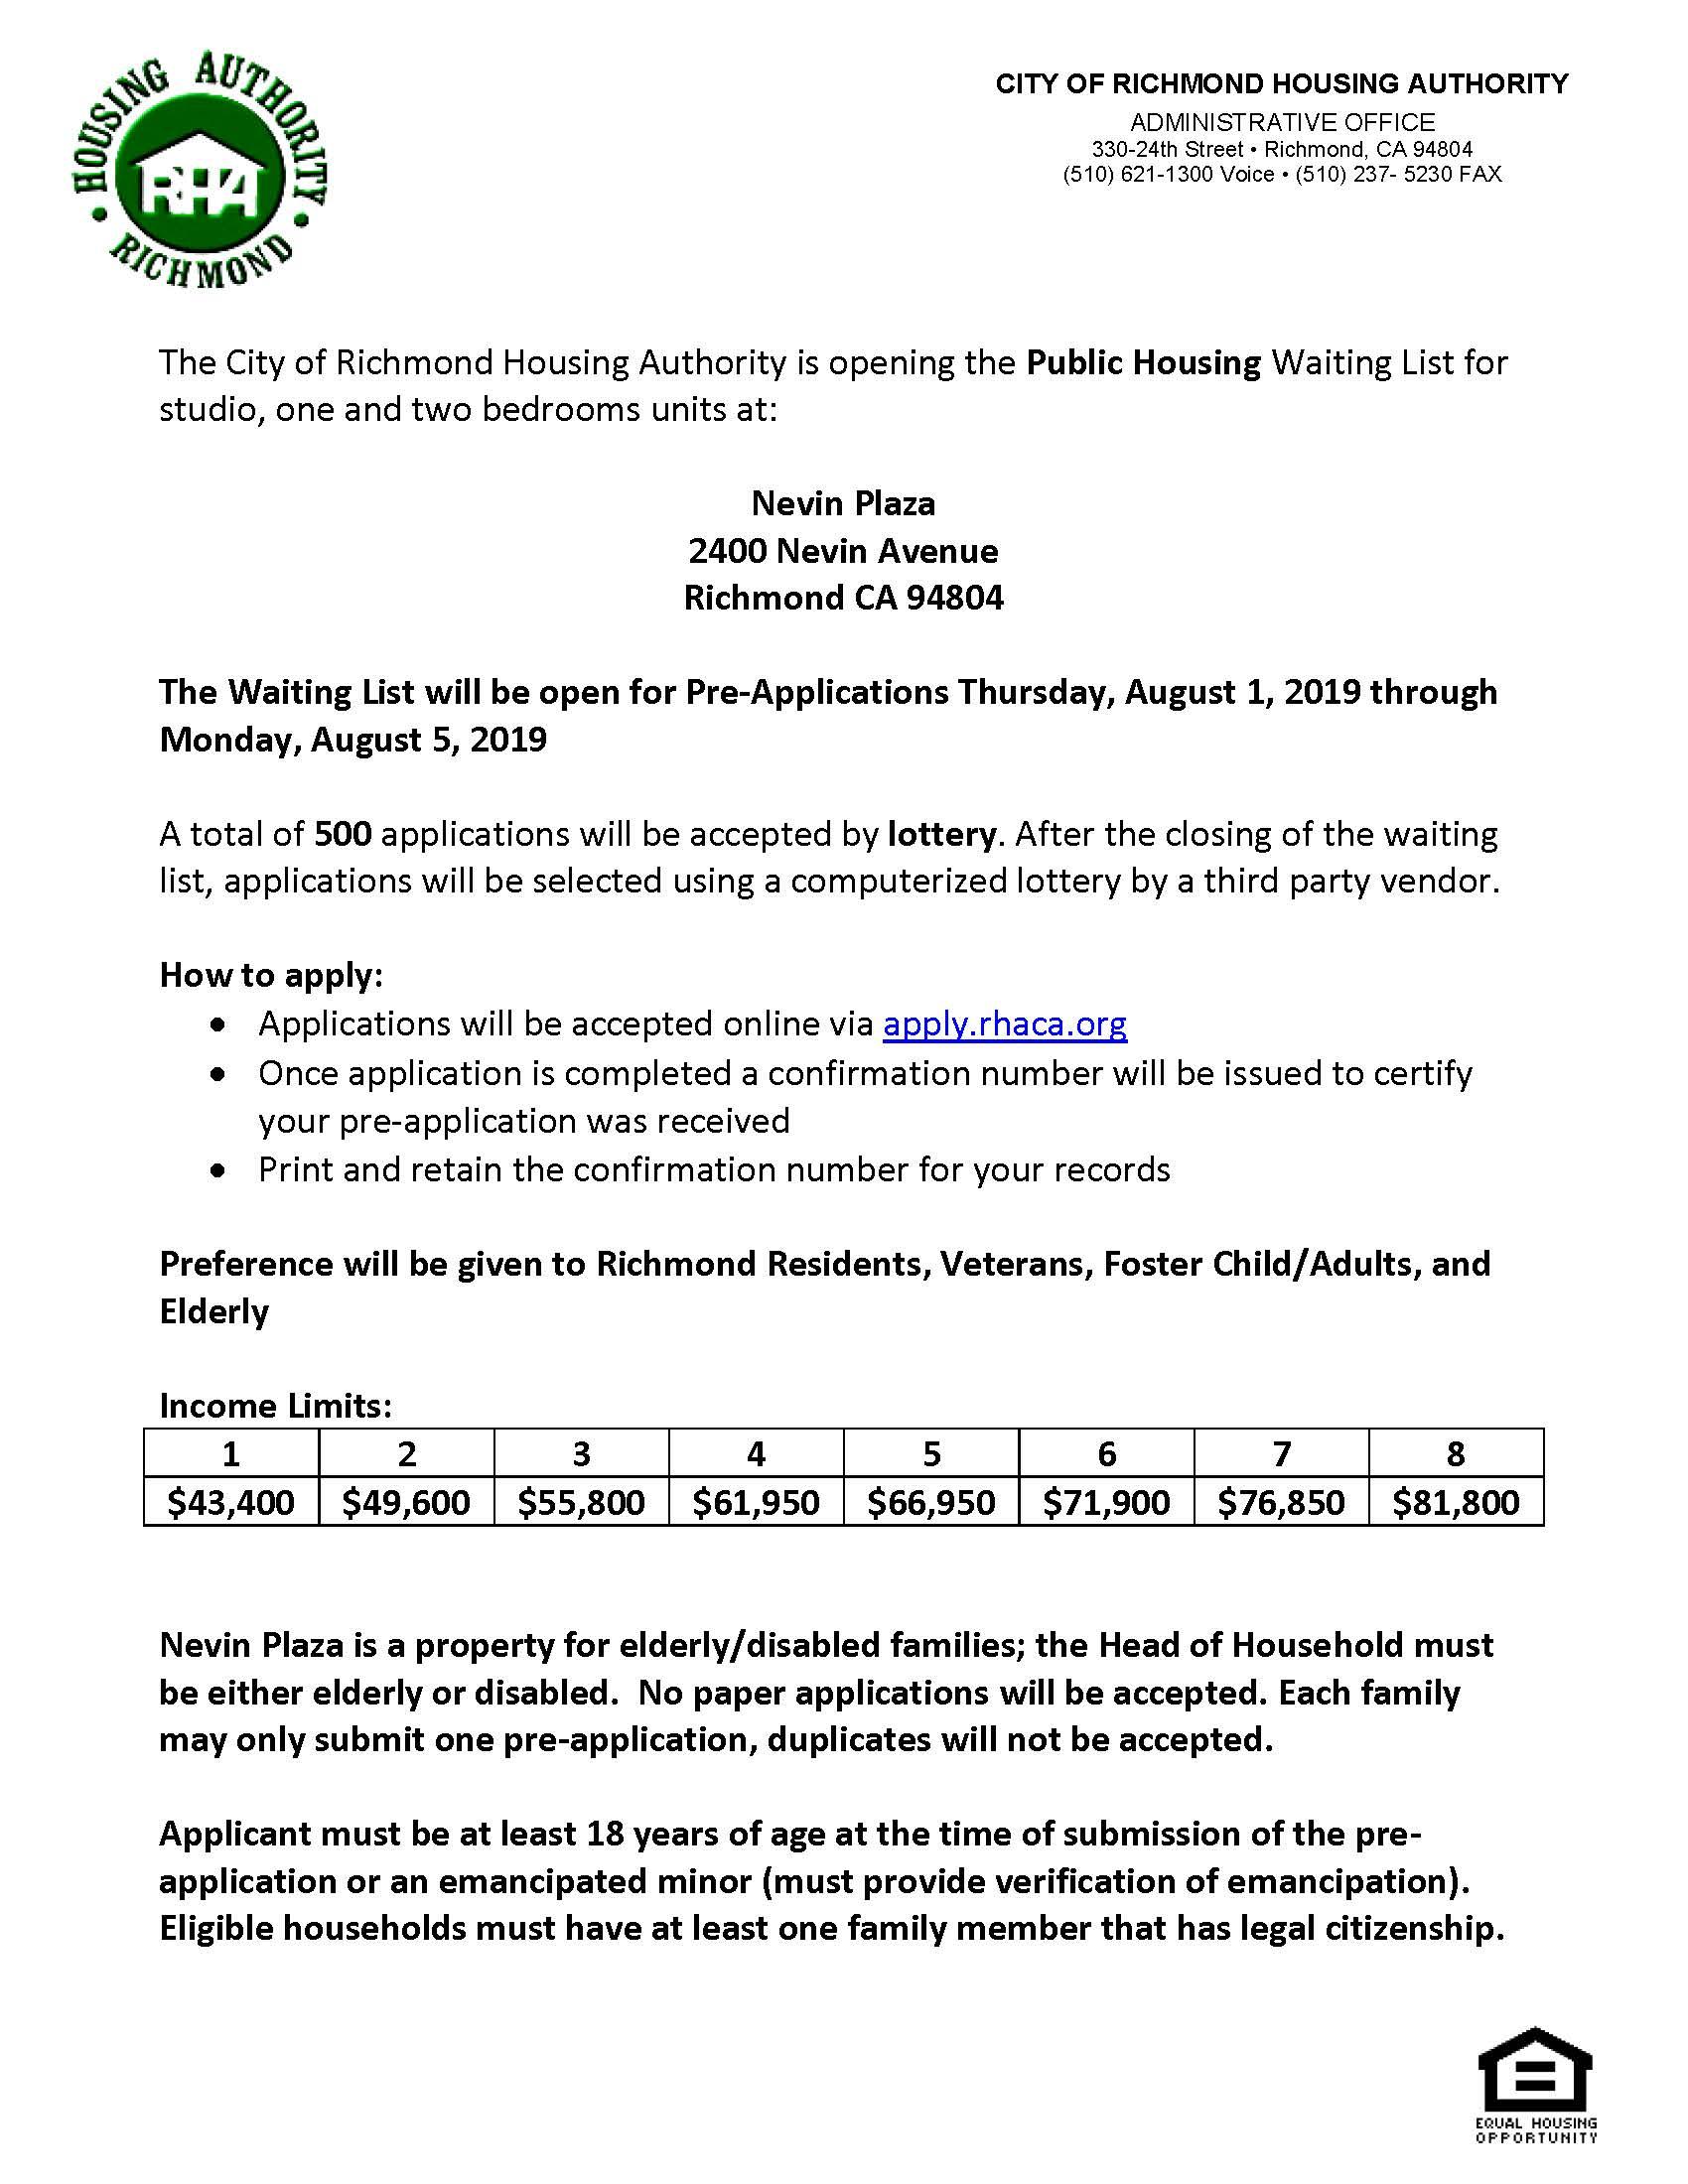 Richmond Housing Authority | Richmond, CA - Official Website